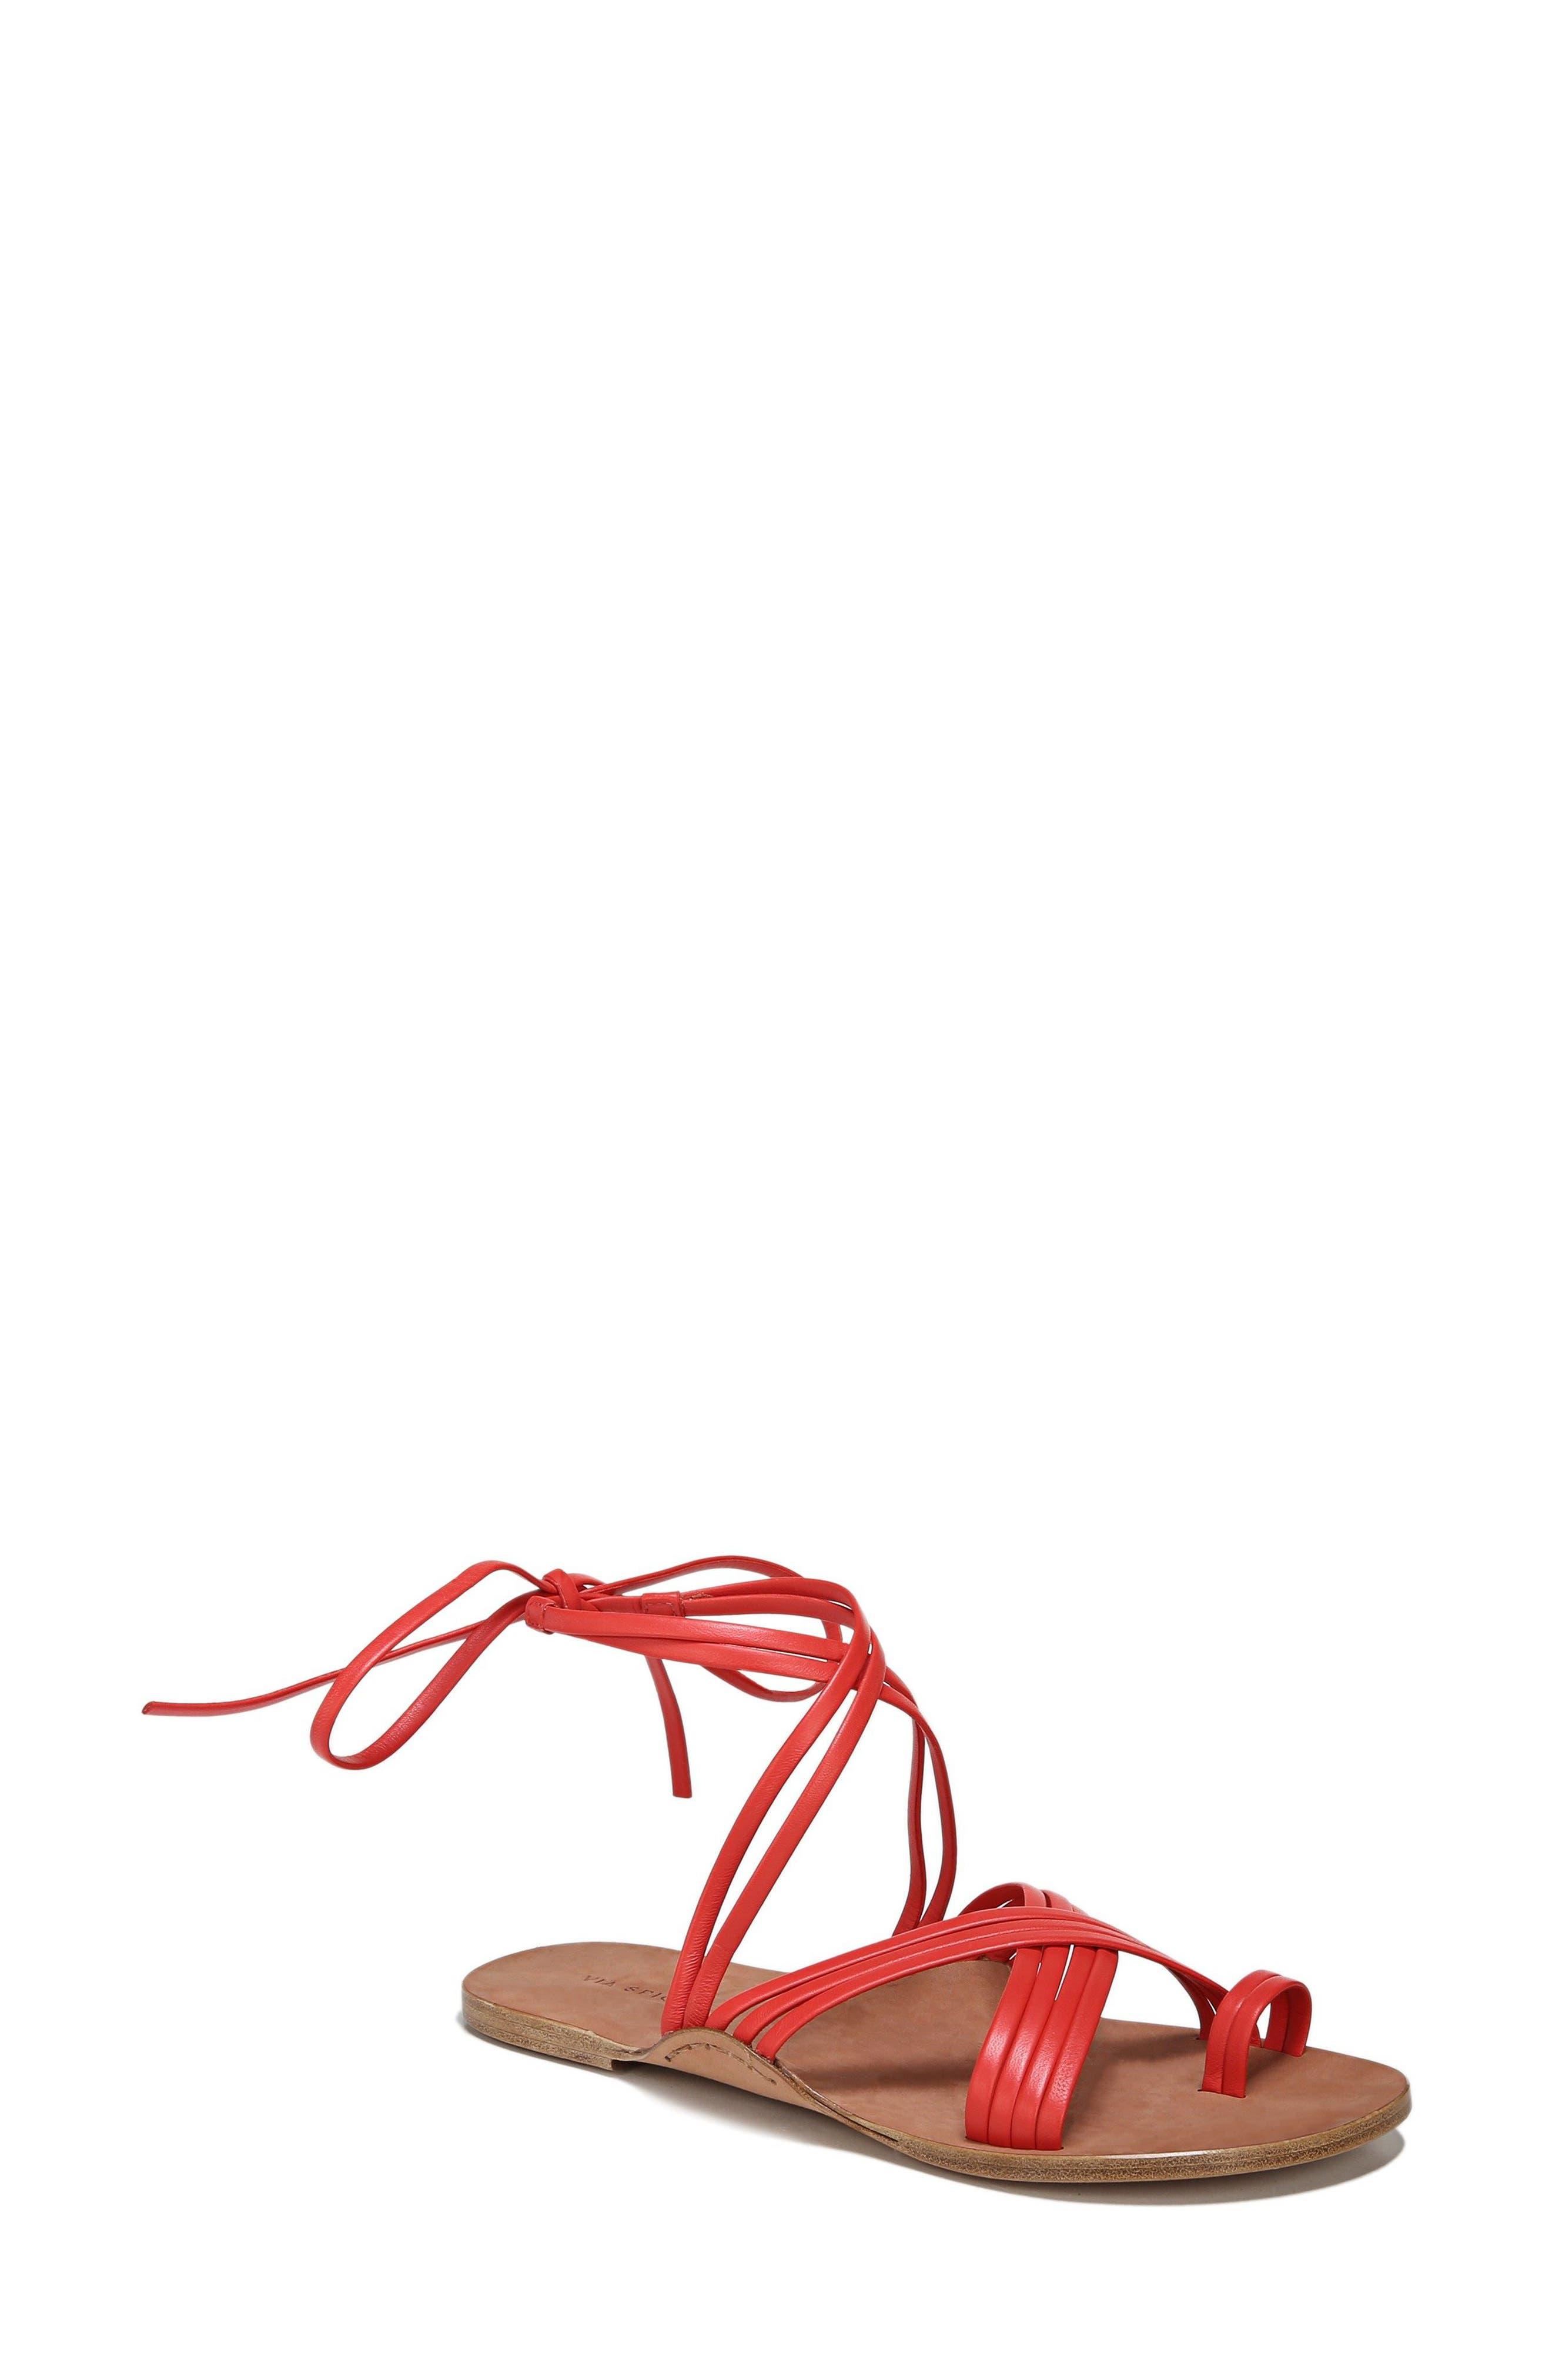 Allegra Sandal,                         Main,                         color, Poppy Red Leather